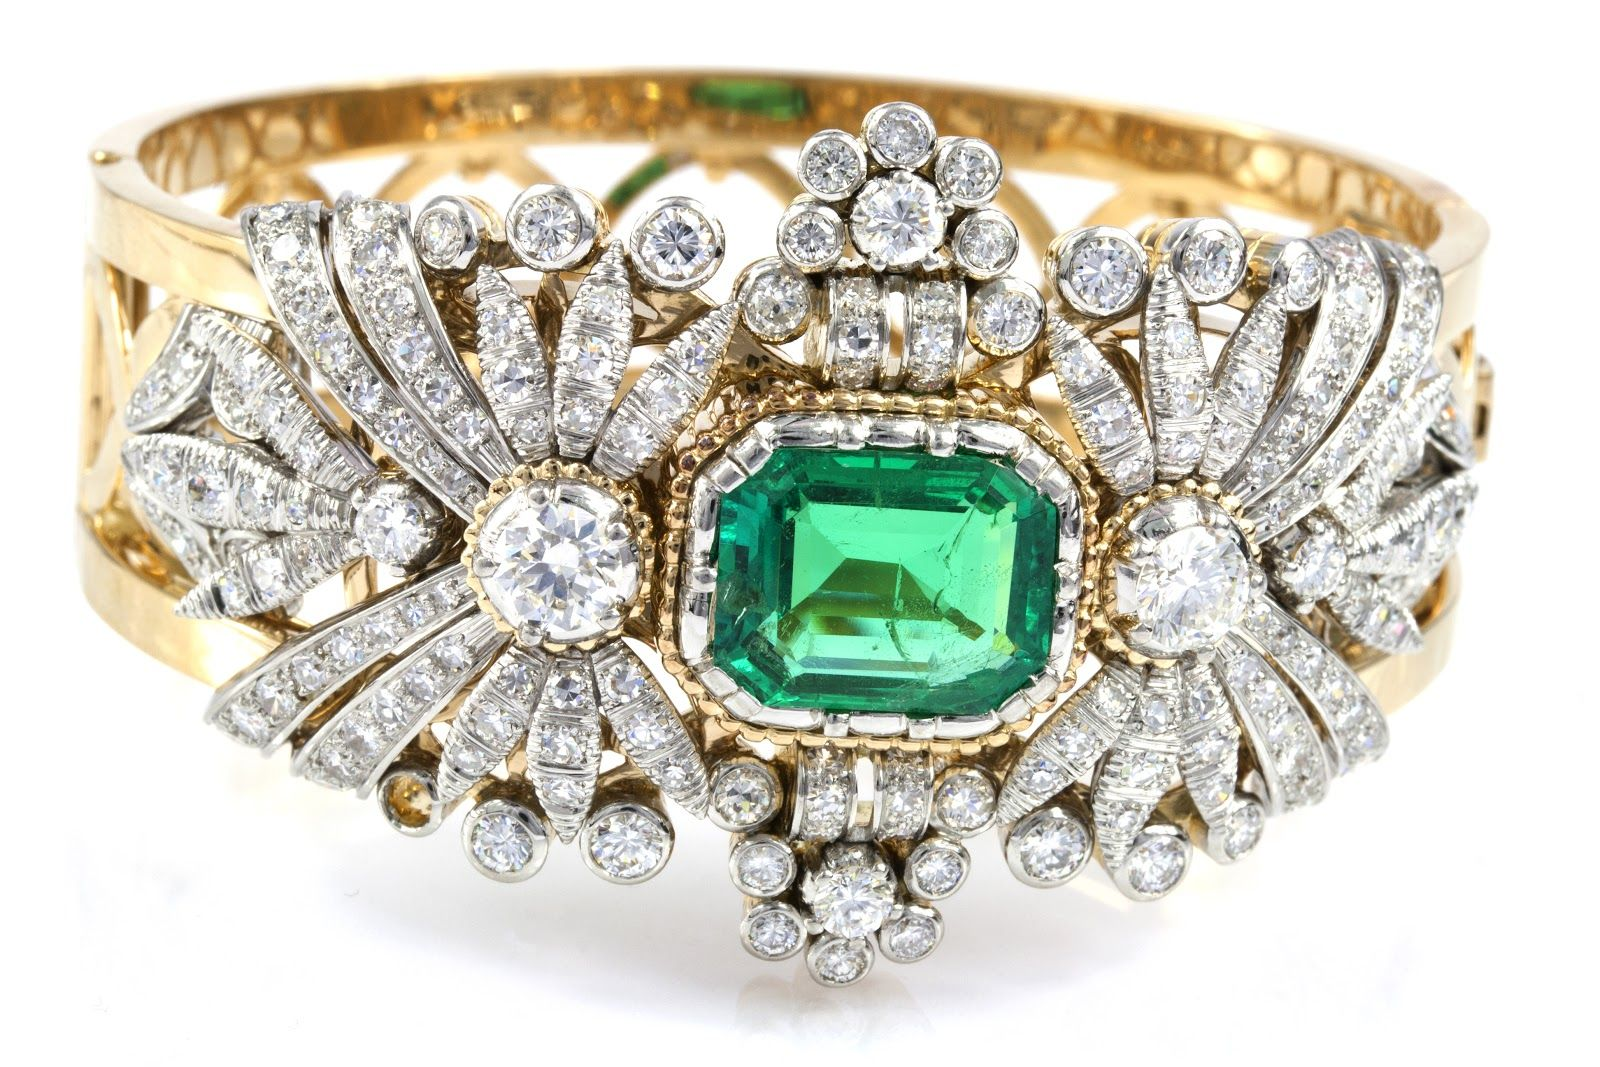 d785f5173 Chanel Fine Jewelry emerald and diamond cuff @Josephine Kimberling  Kimberling Kimberling vogel